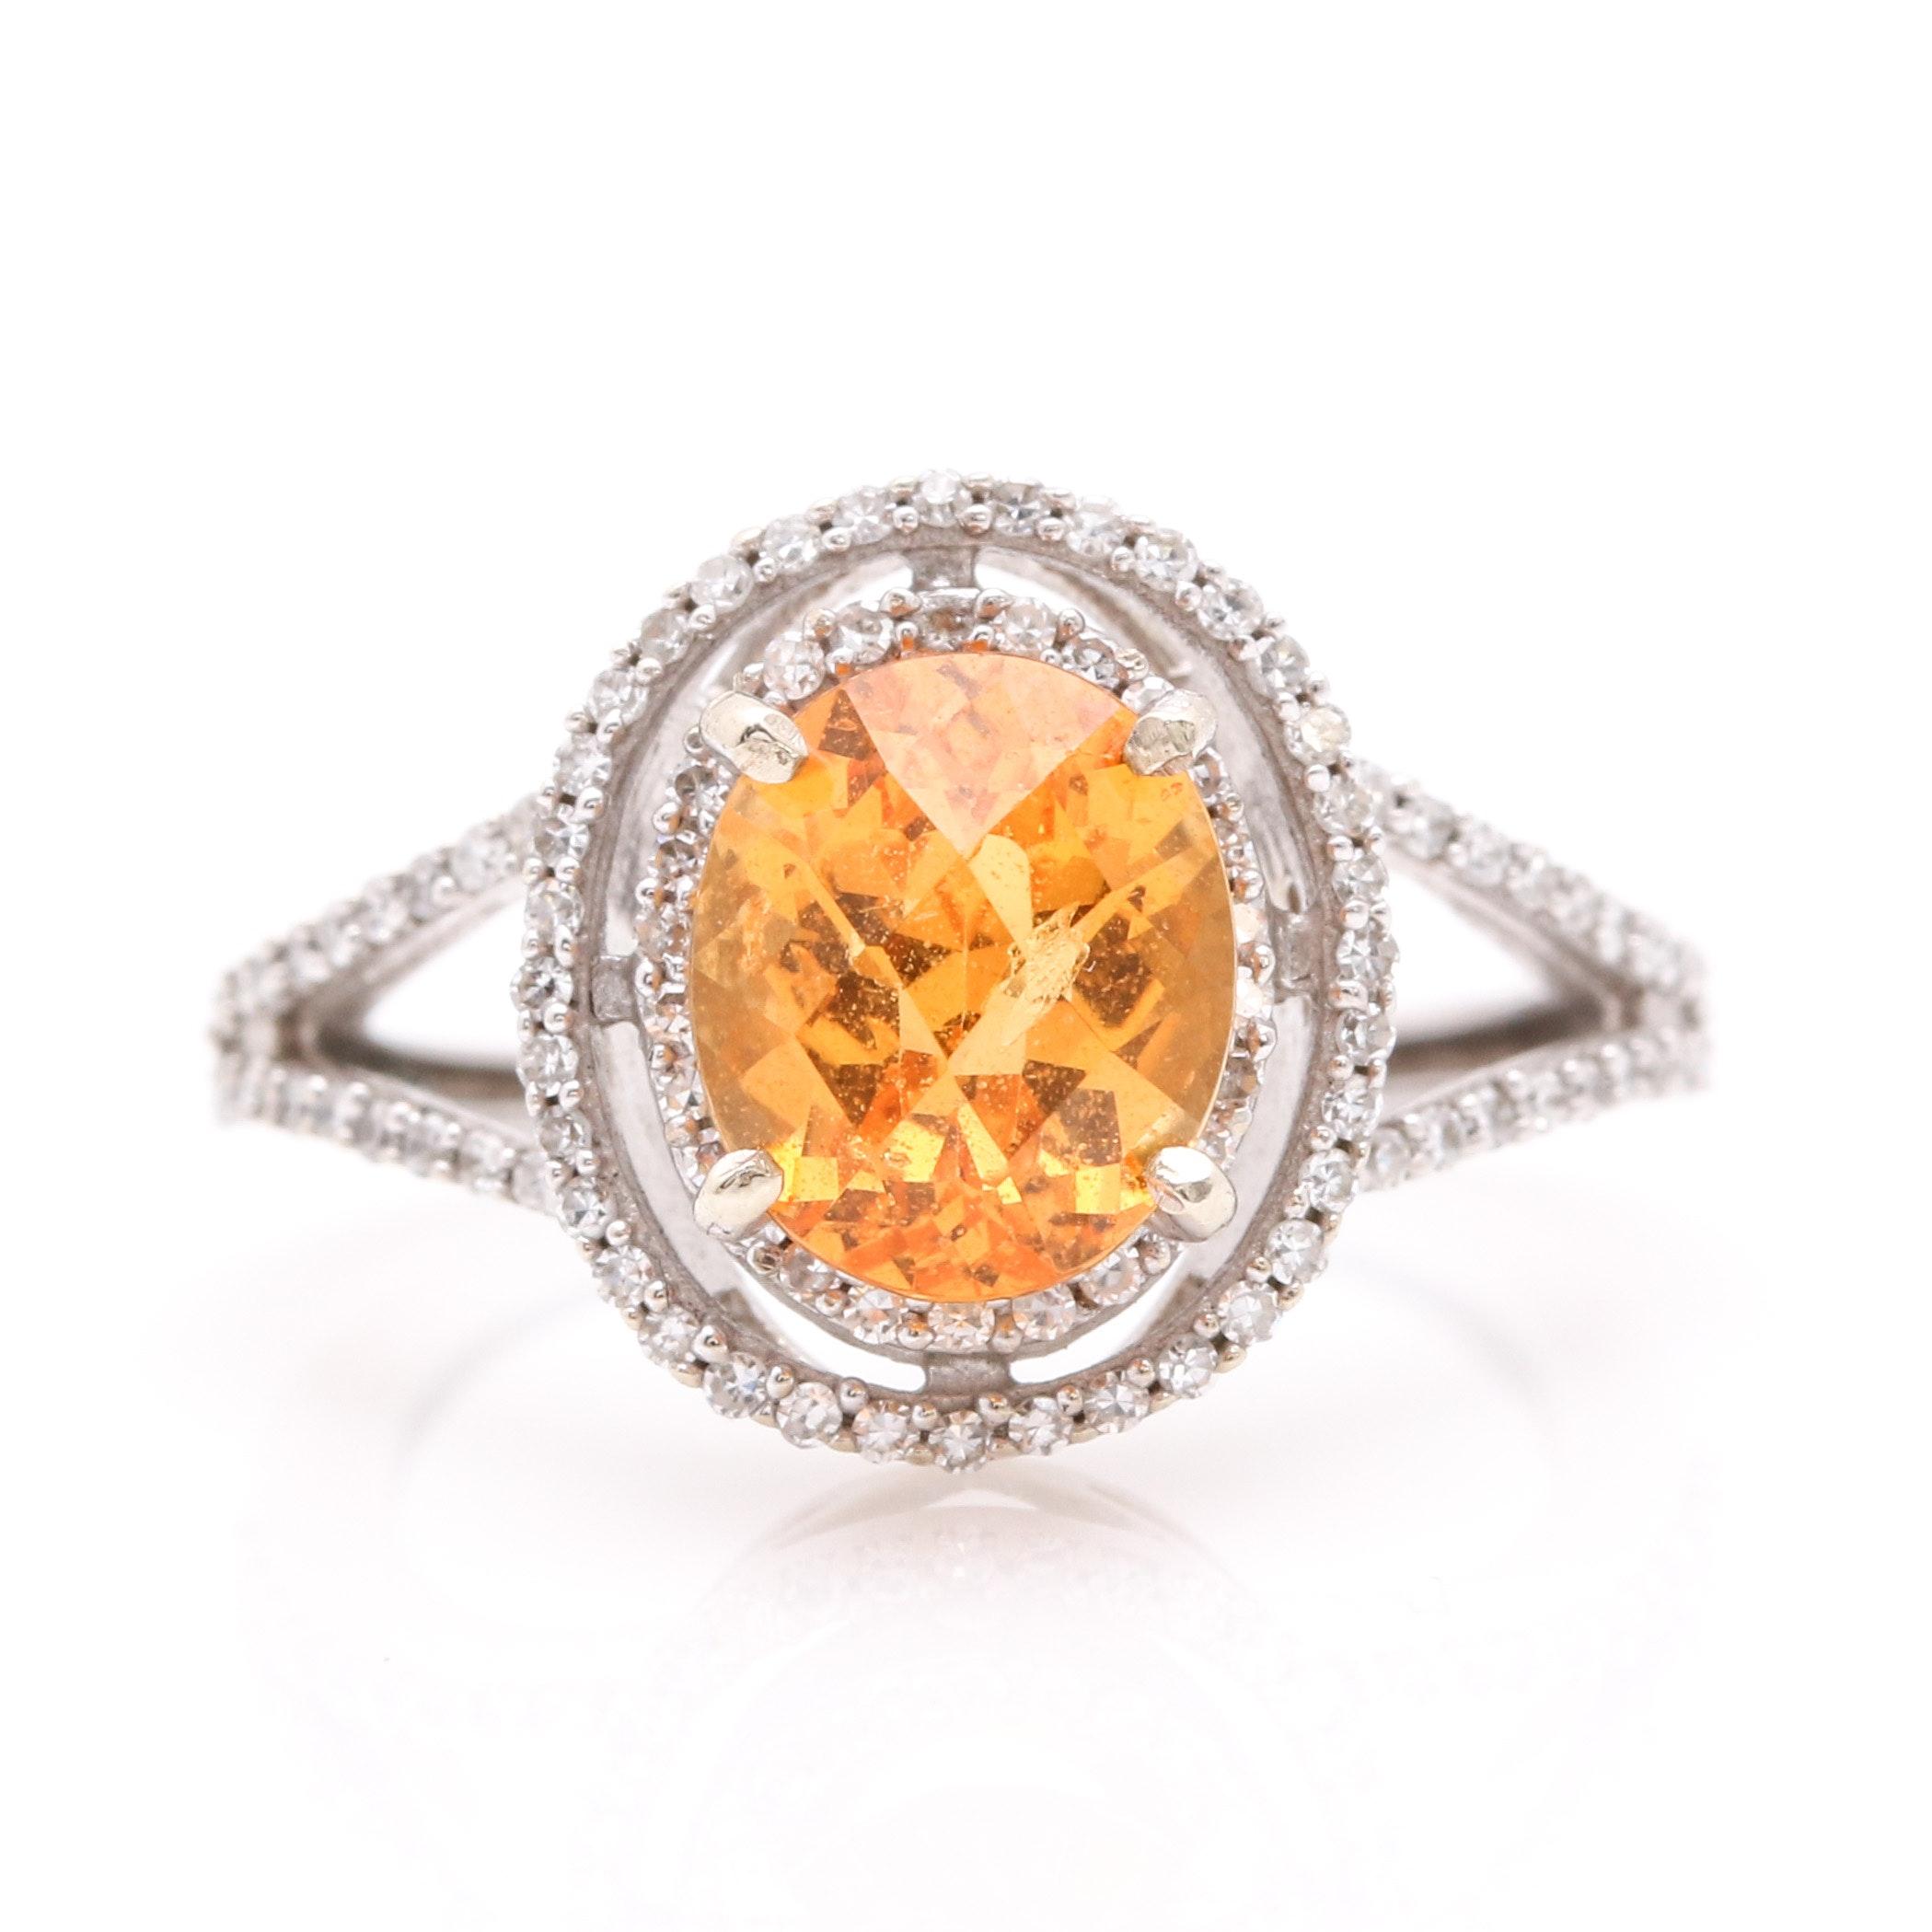 14K White Gold Diamond and Spessartine Garnet Gemstone Ring